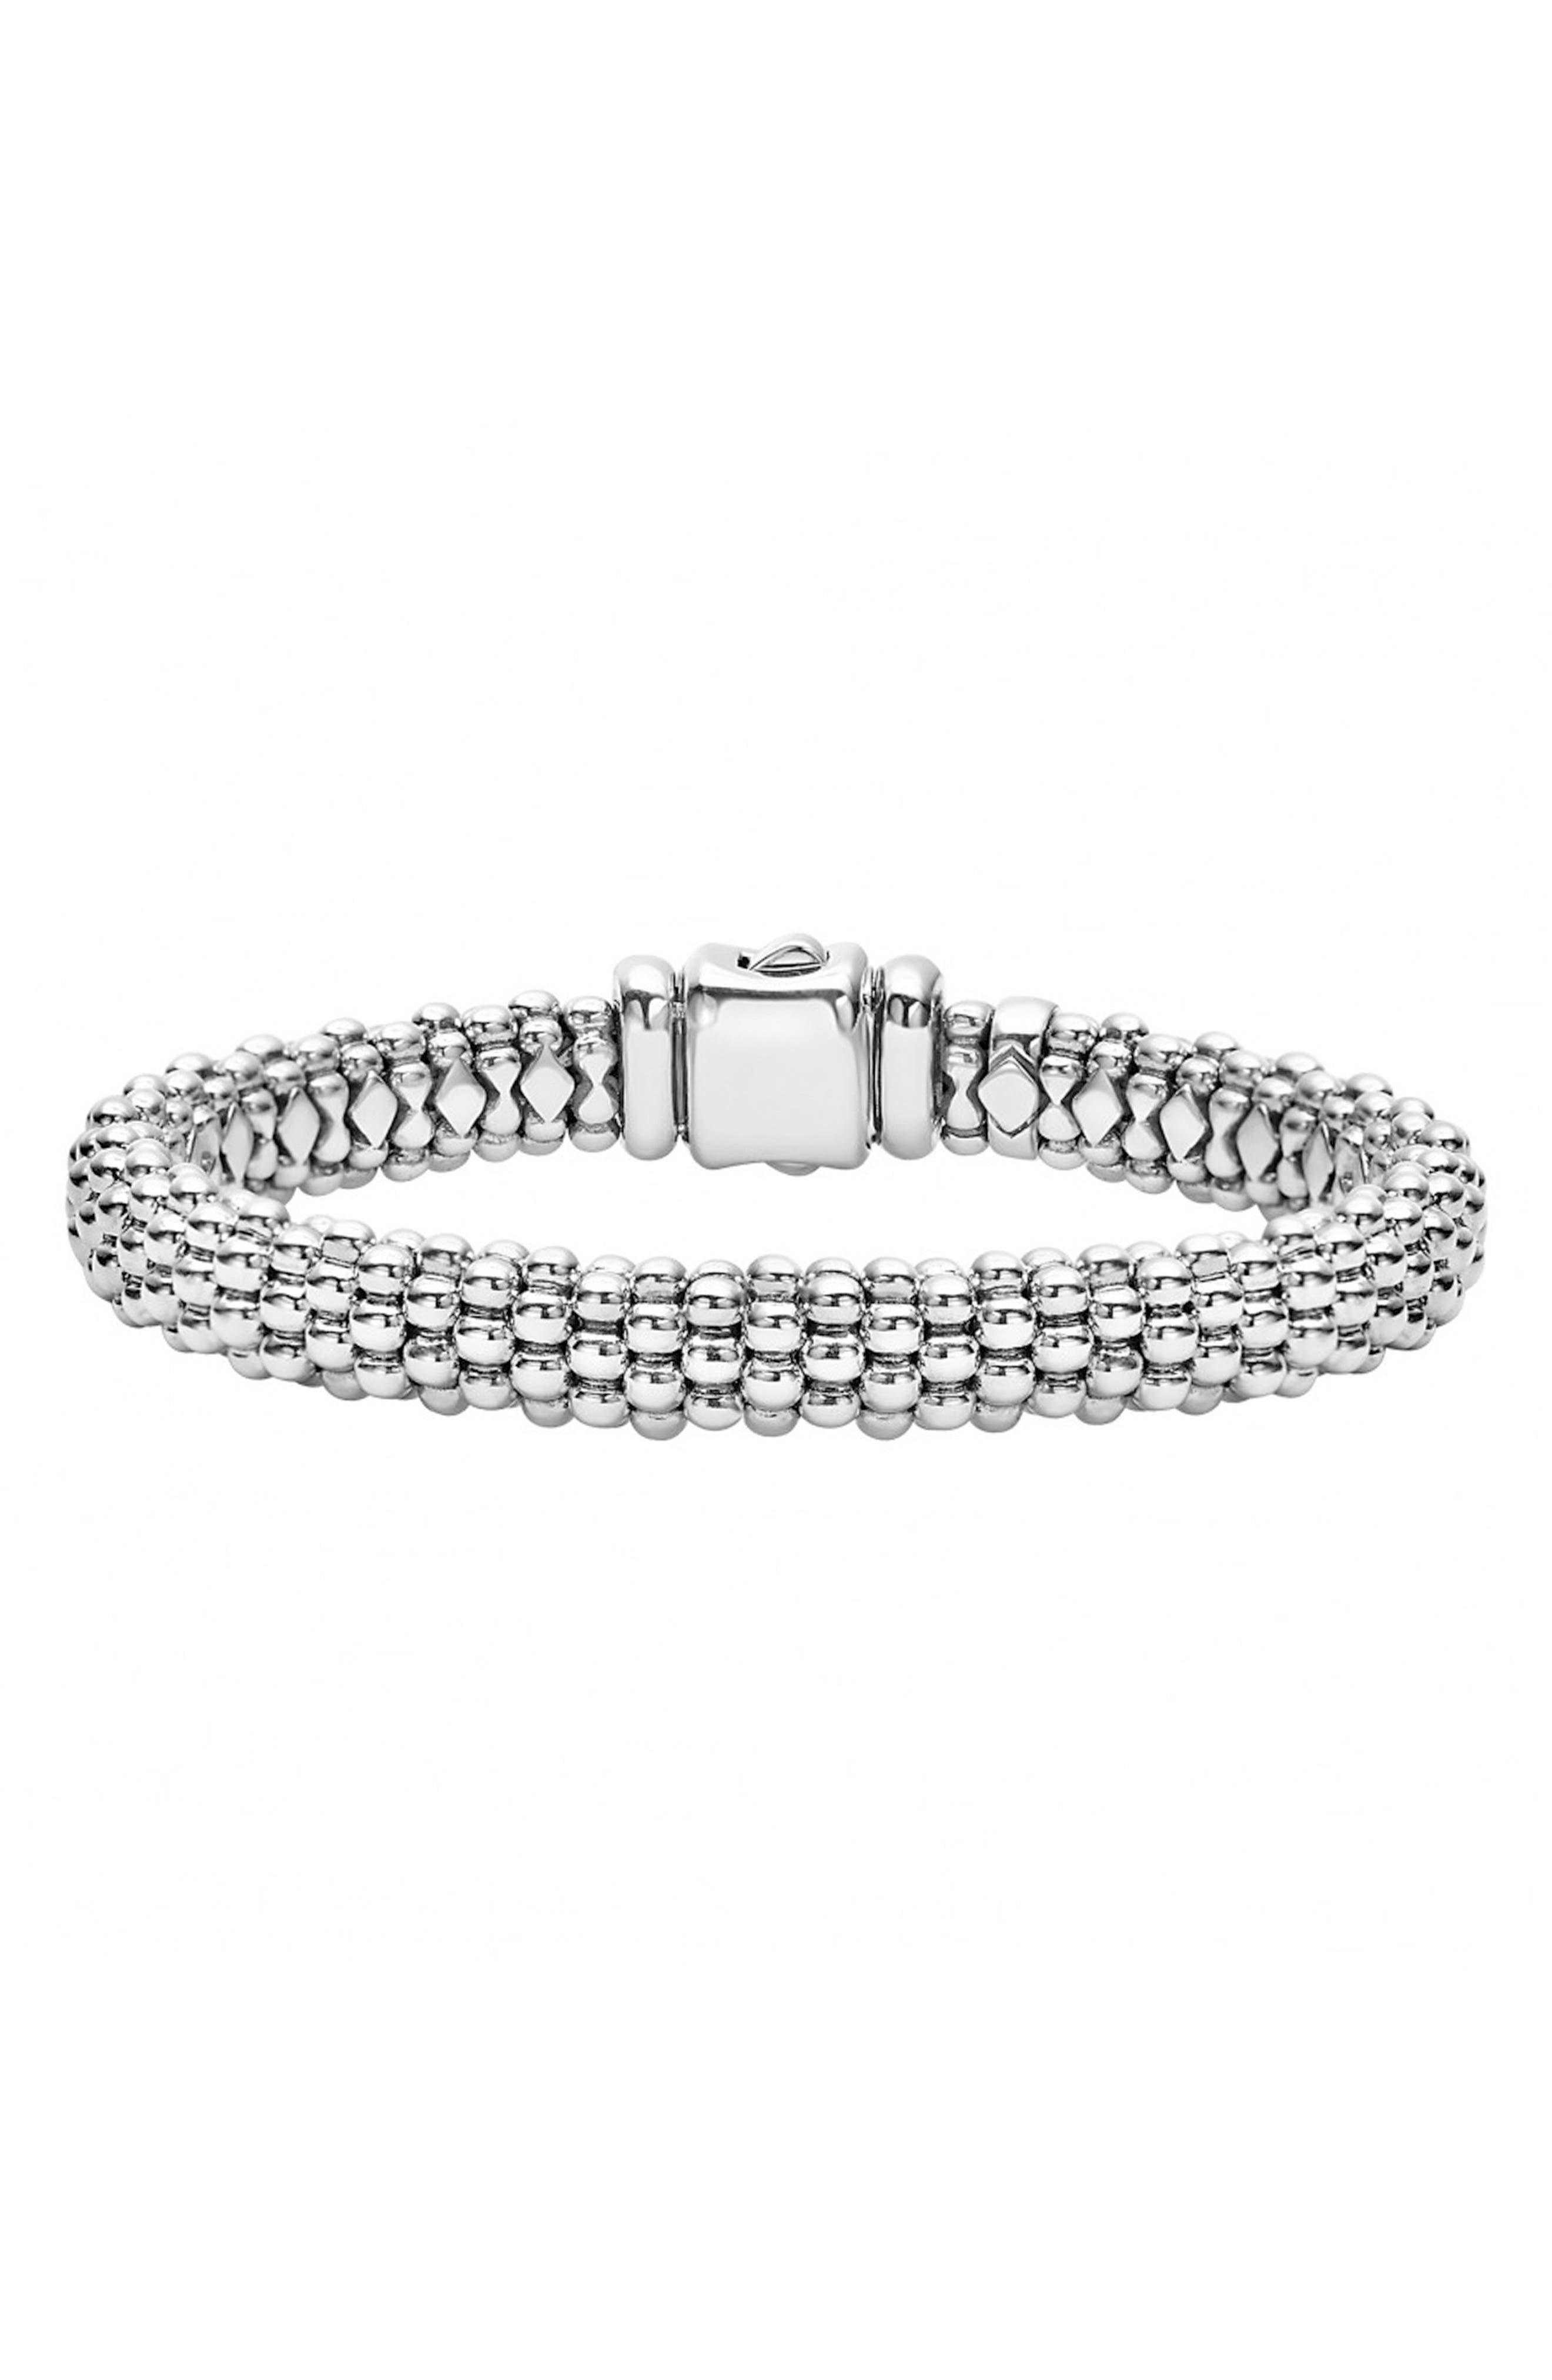 Caviar Rope Bracelet,                             Main thumbnail 1, color,                             Silver